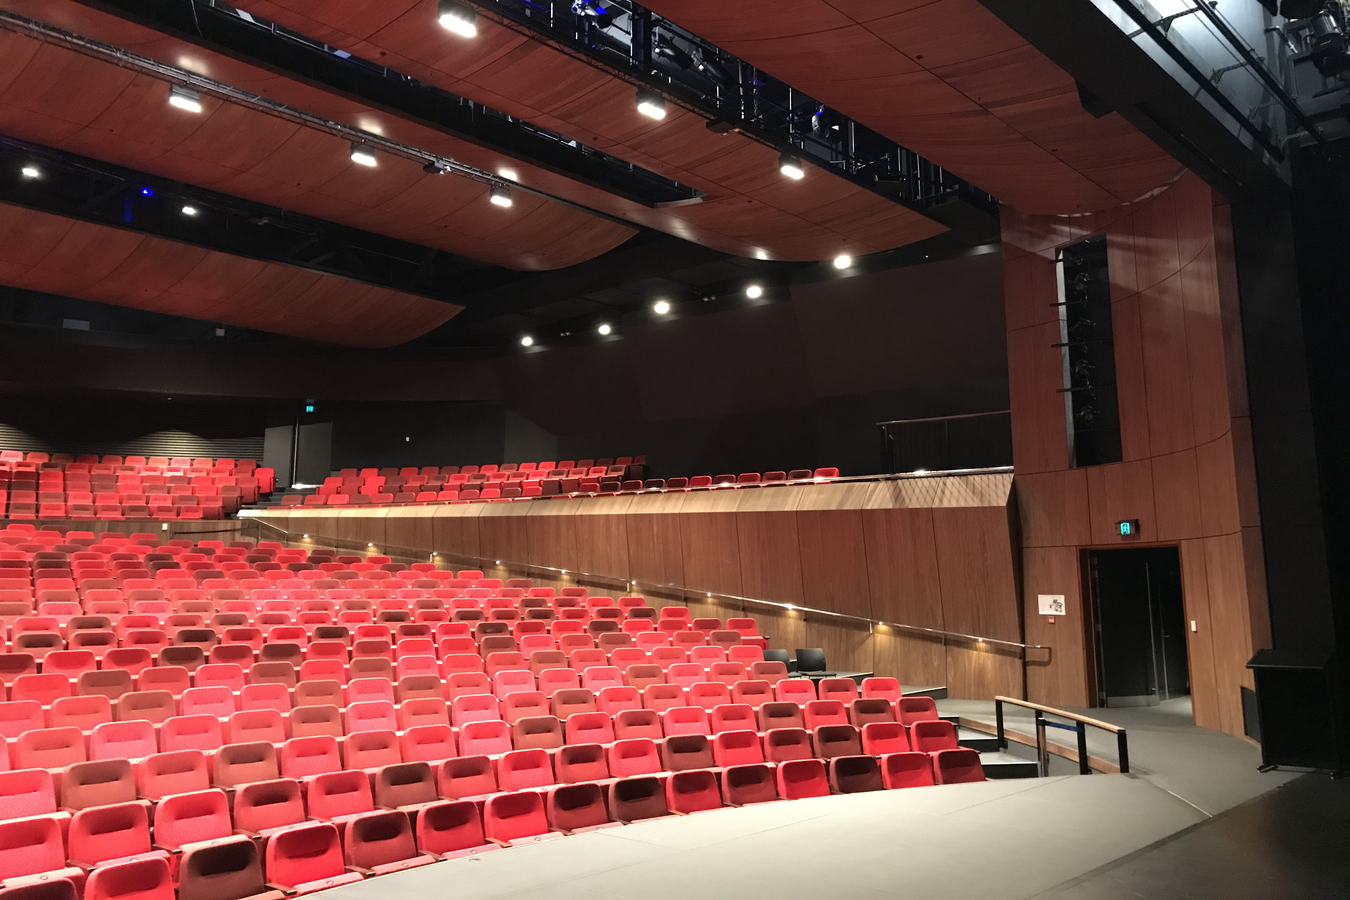 Diocesan Performing Arts Auditorium